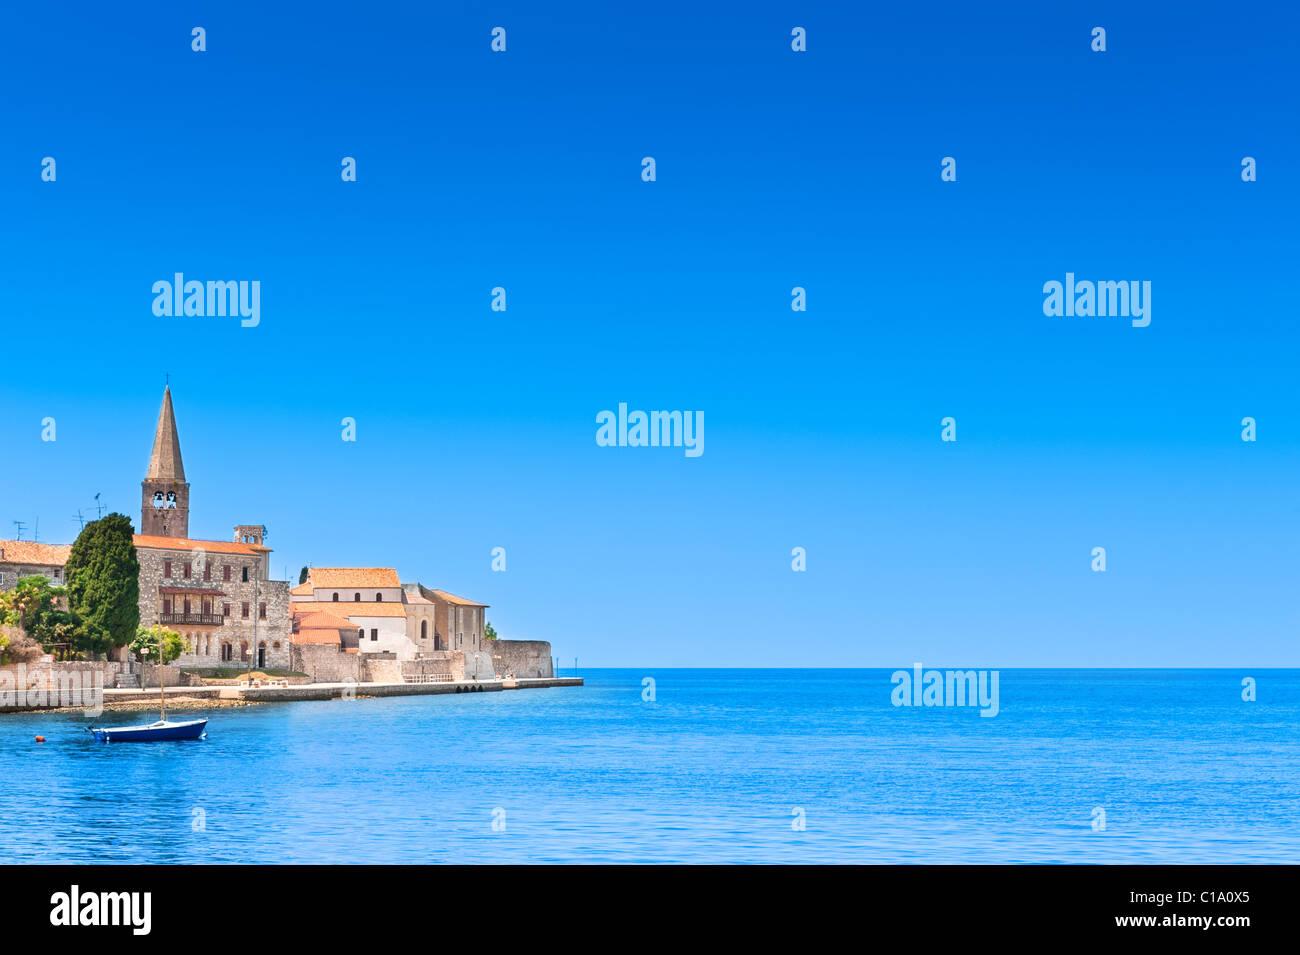 Porec Altstadt in Kroatien, Adria, Istrien Region beliebtes Touristenziel. Exemplar auf blauen Himmel. Stockbild